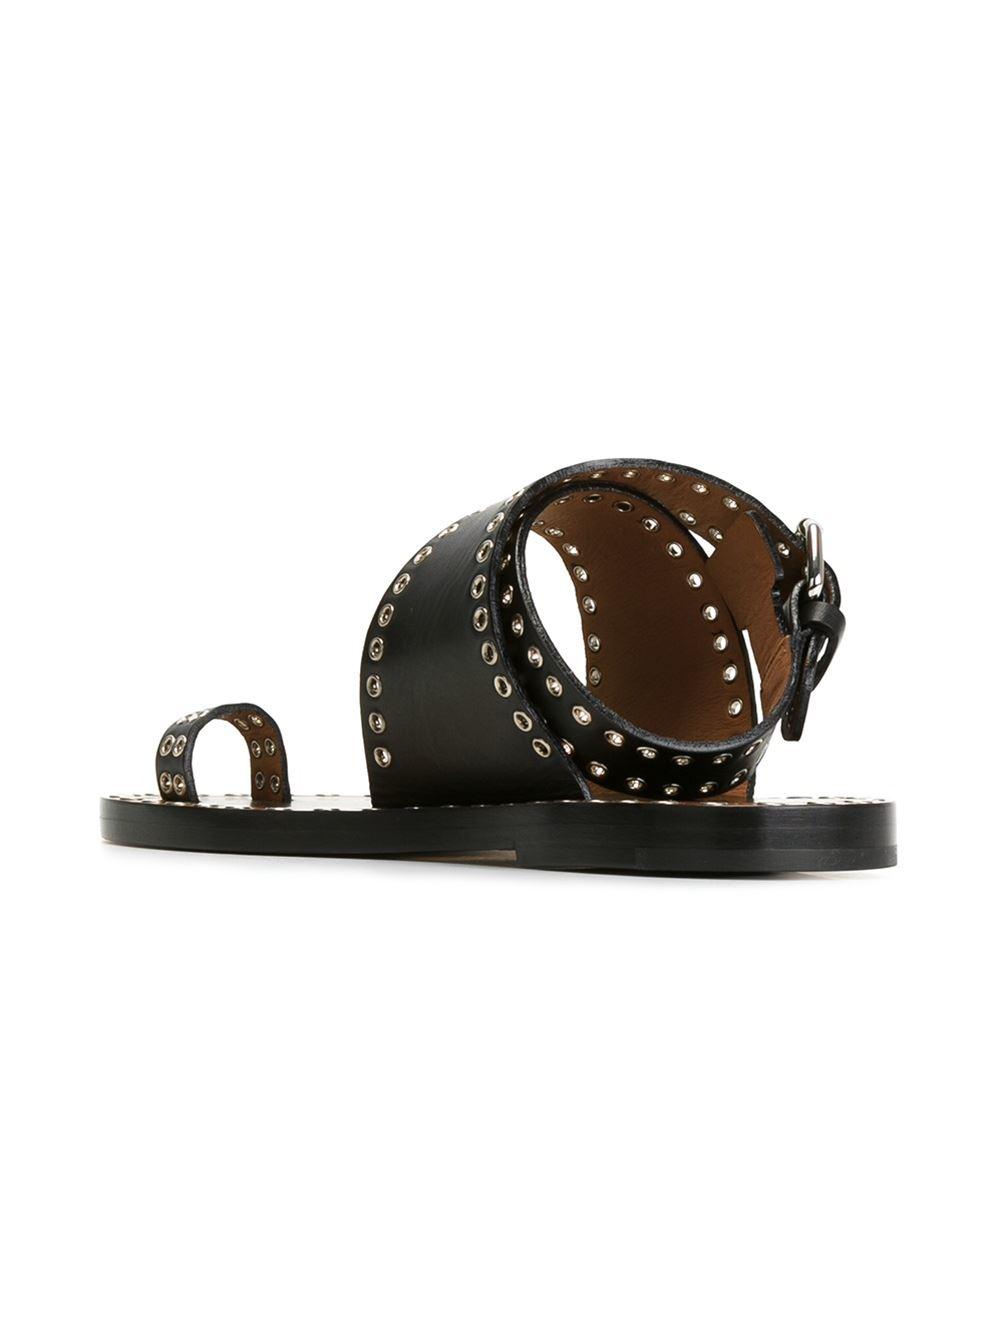 Lyst Isabel Marant 201 Toile Jools Studded Sandals In Black